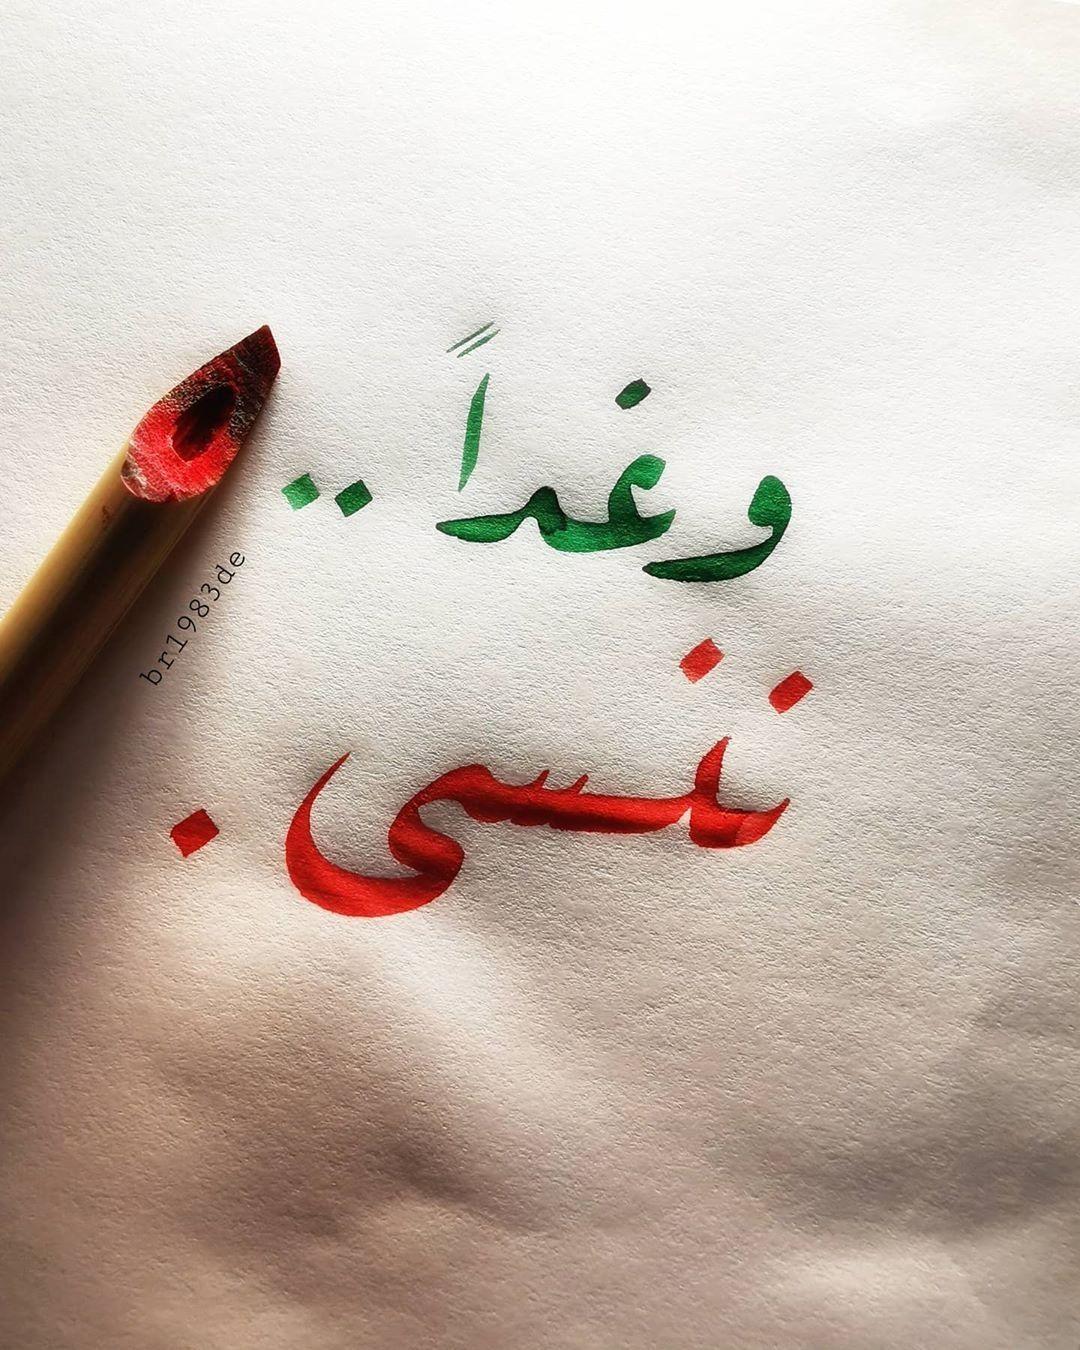 Pin By Manar Dakrory On كلمات Beautiful Arabic Words Glitter Pens Art Handwritten Quotes